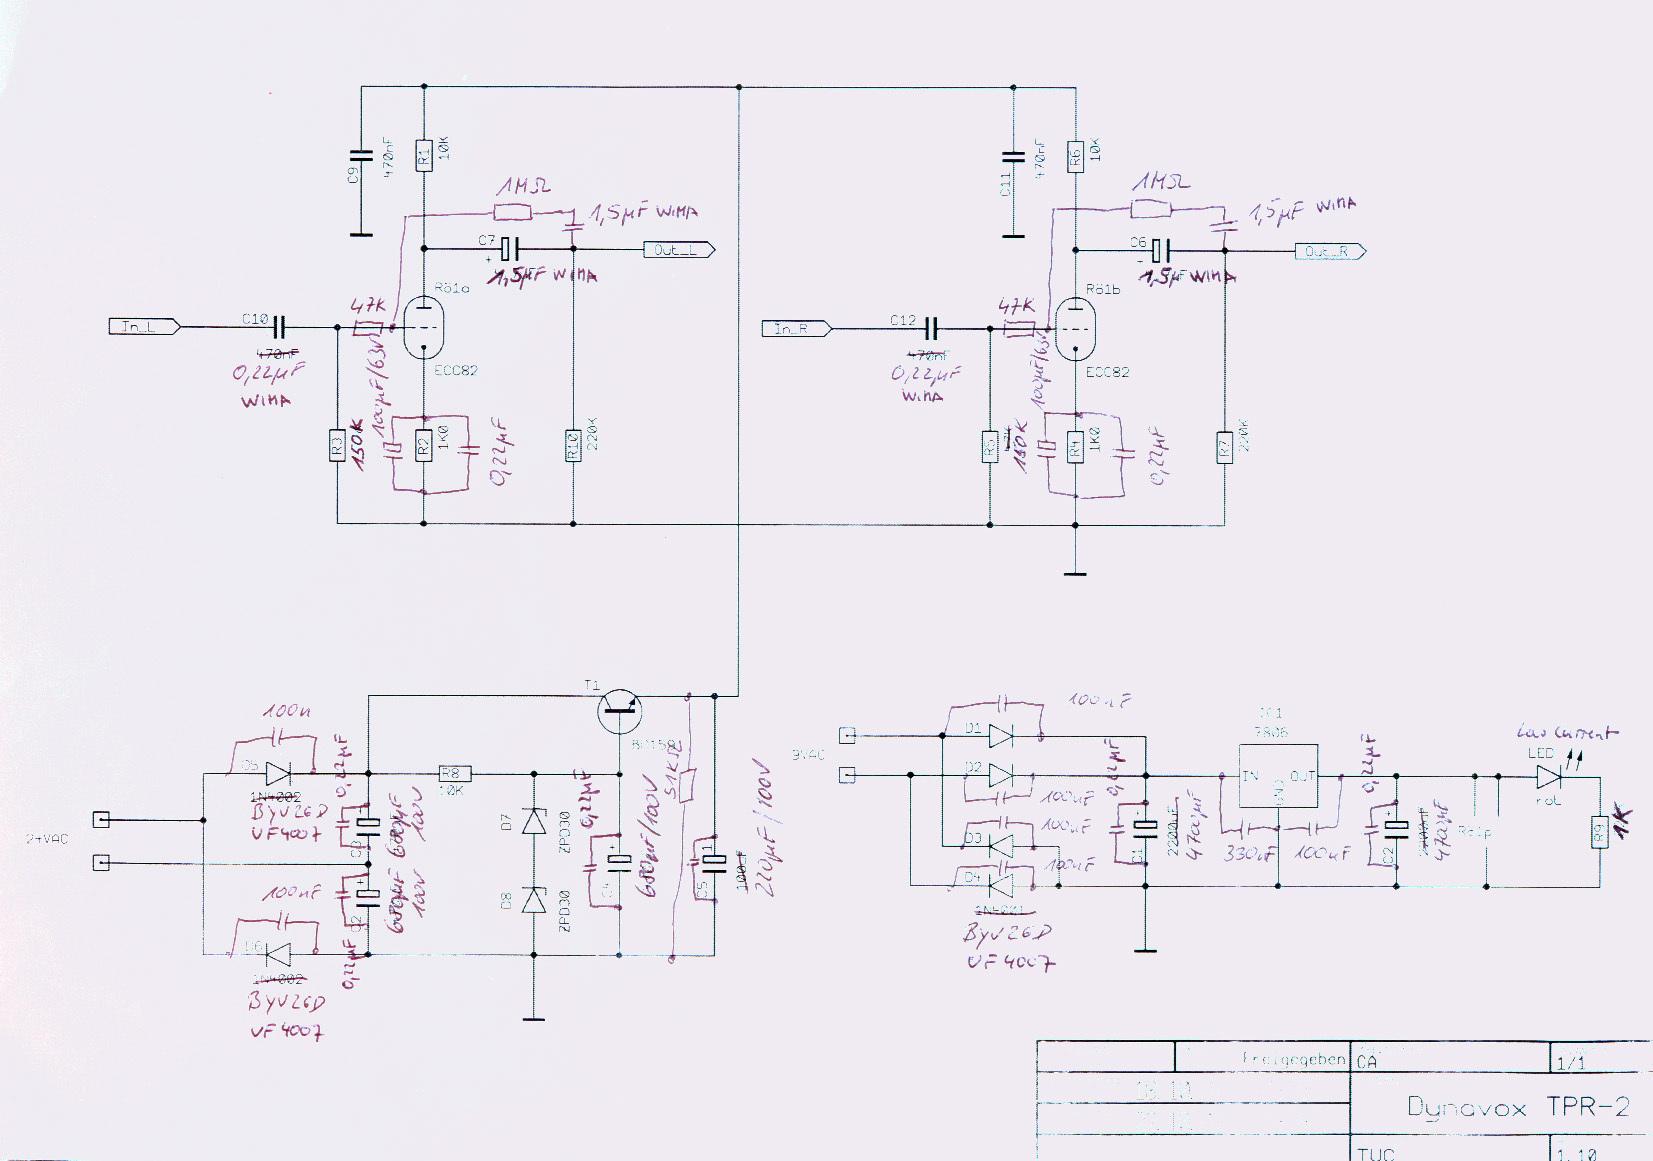 schema-tube-board-tpr2_514663.jpg